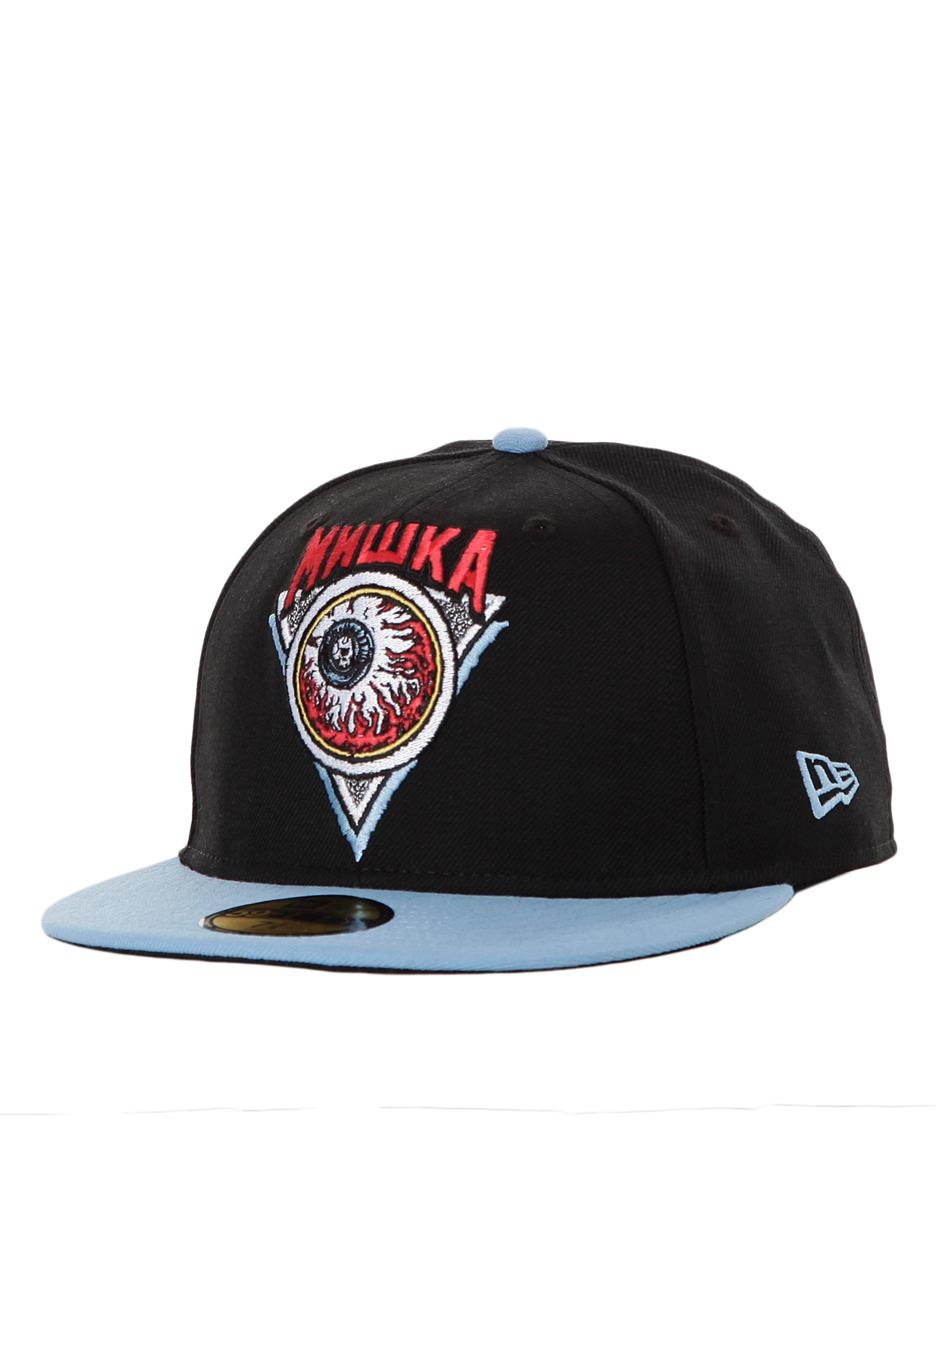 Mishka - Keep Watch Or Die New Era Black Light Blue - Cap ... 1f03d4a71231e